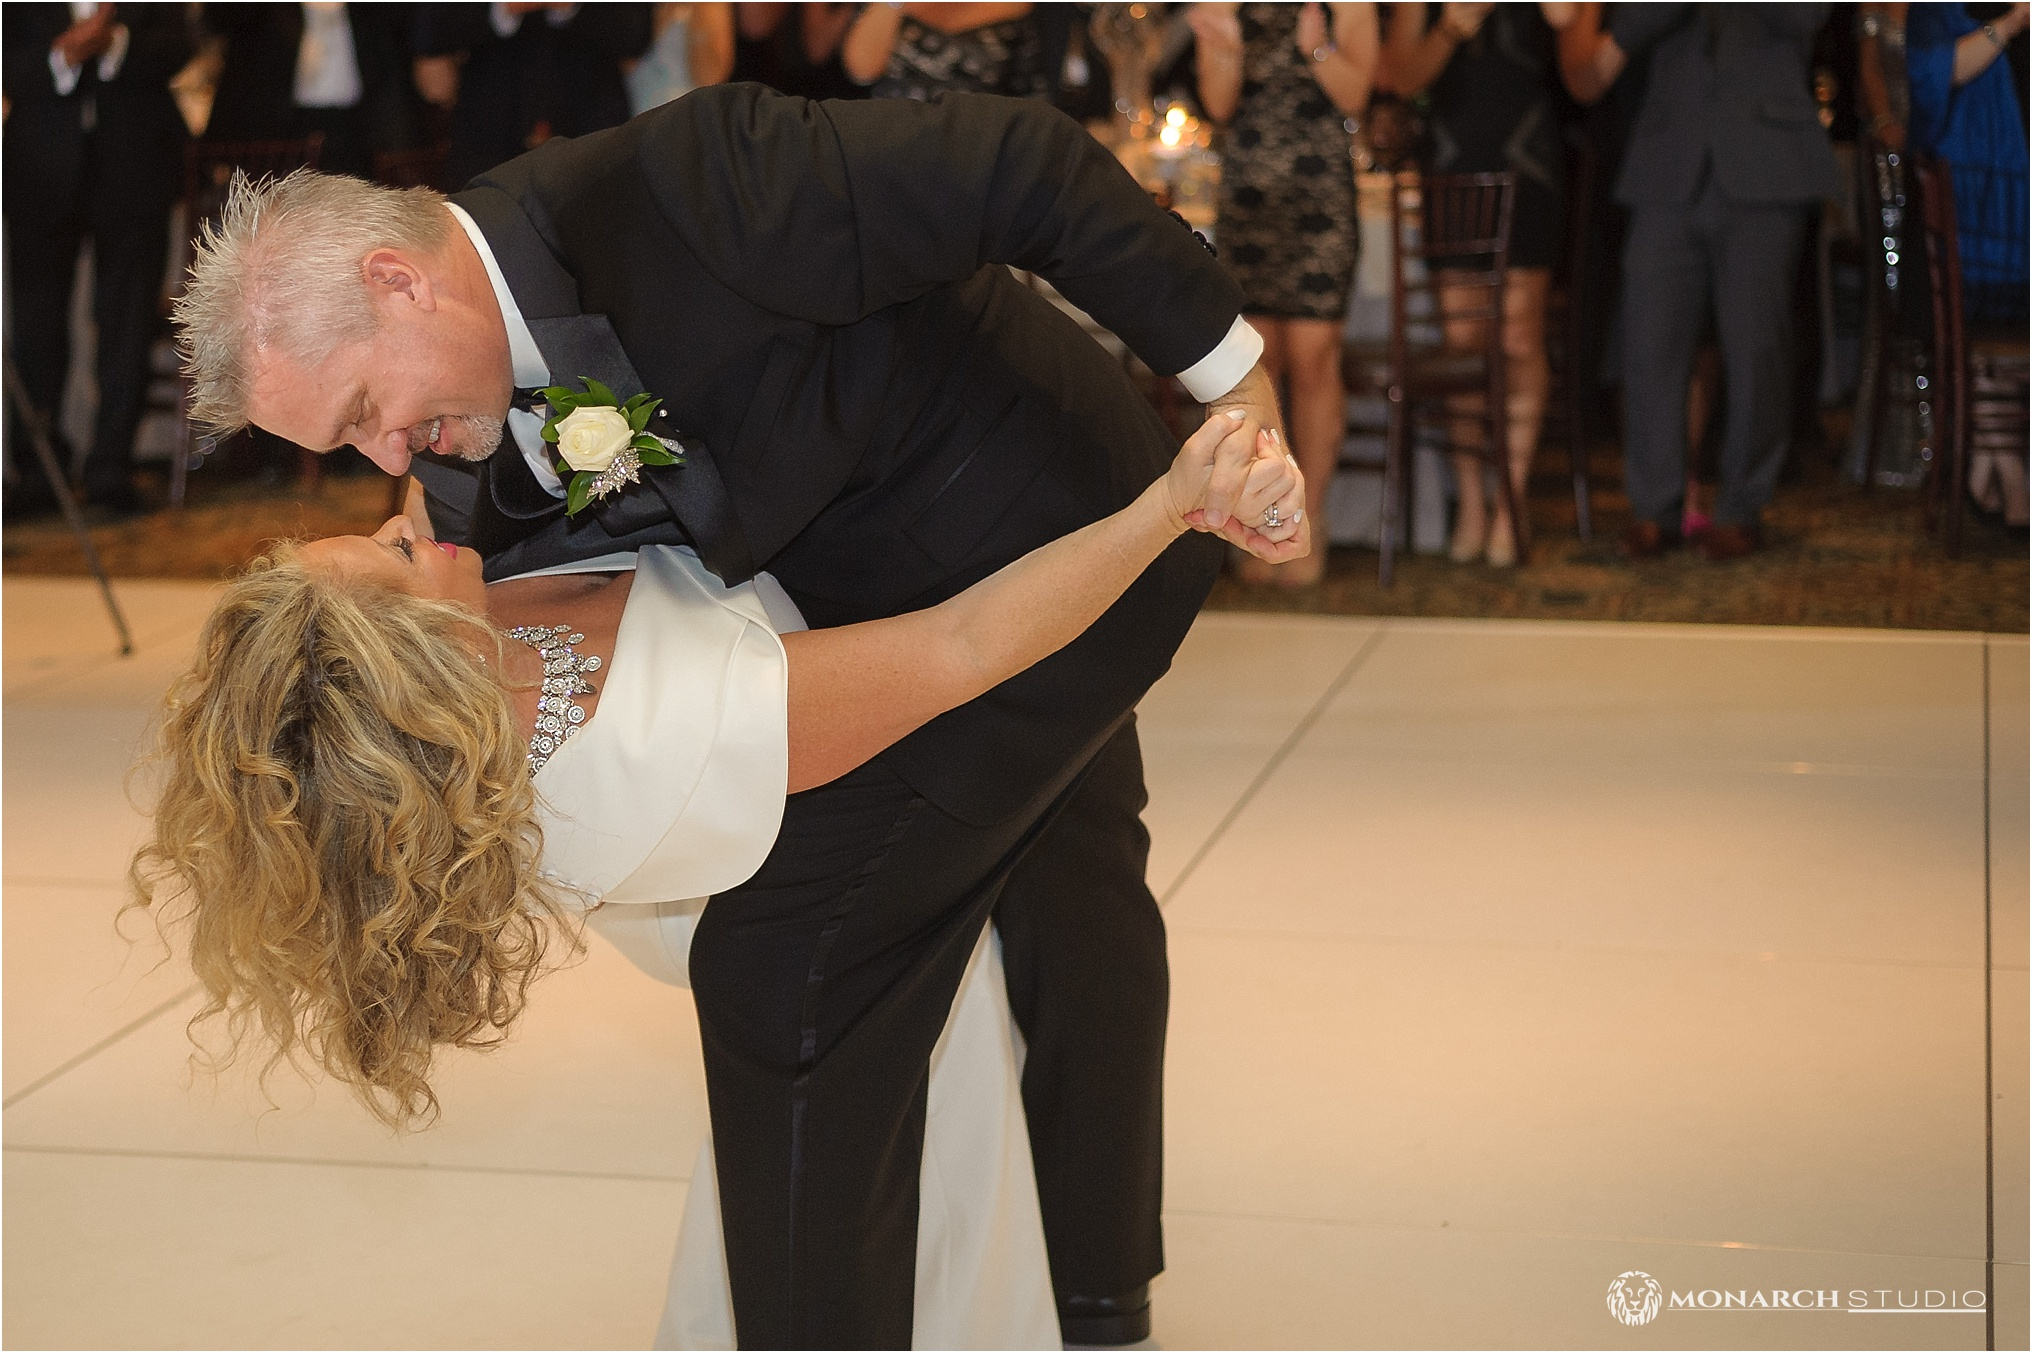 ponte-vedra-wedding-photographer-tpc102.jpg